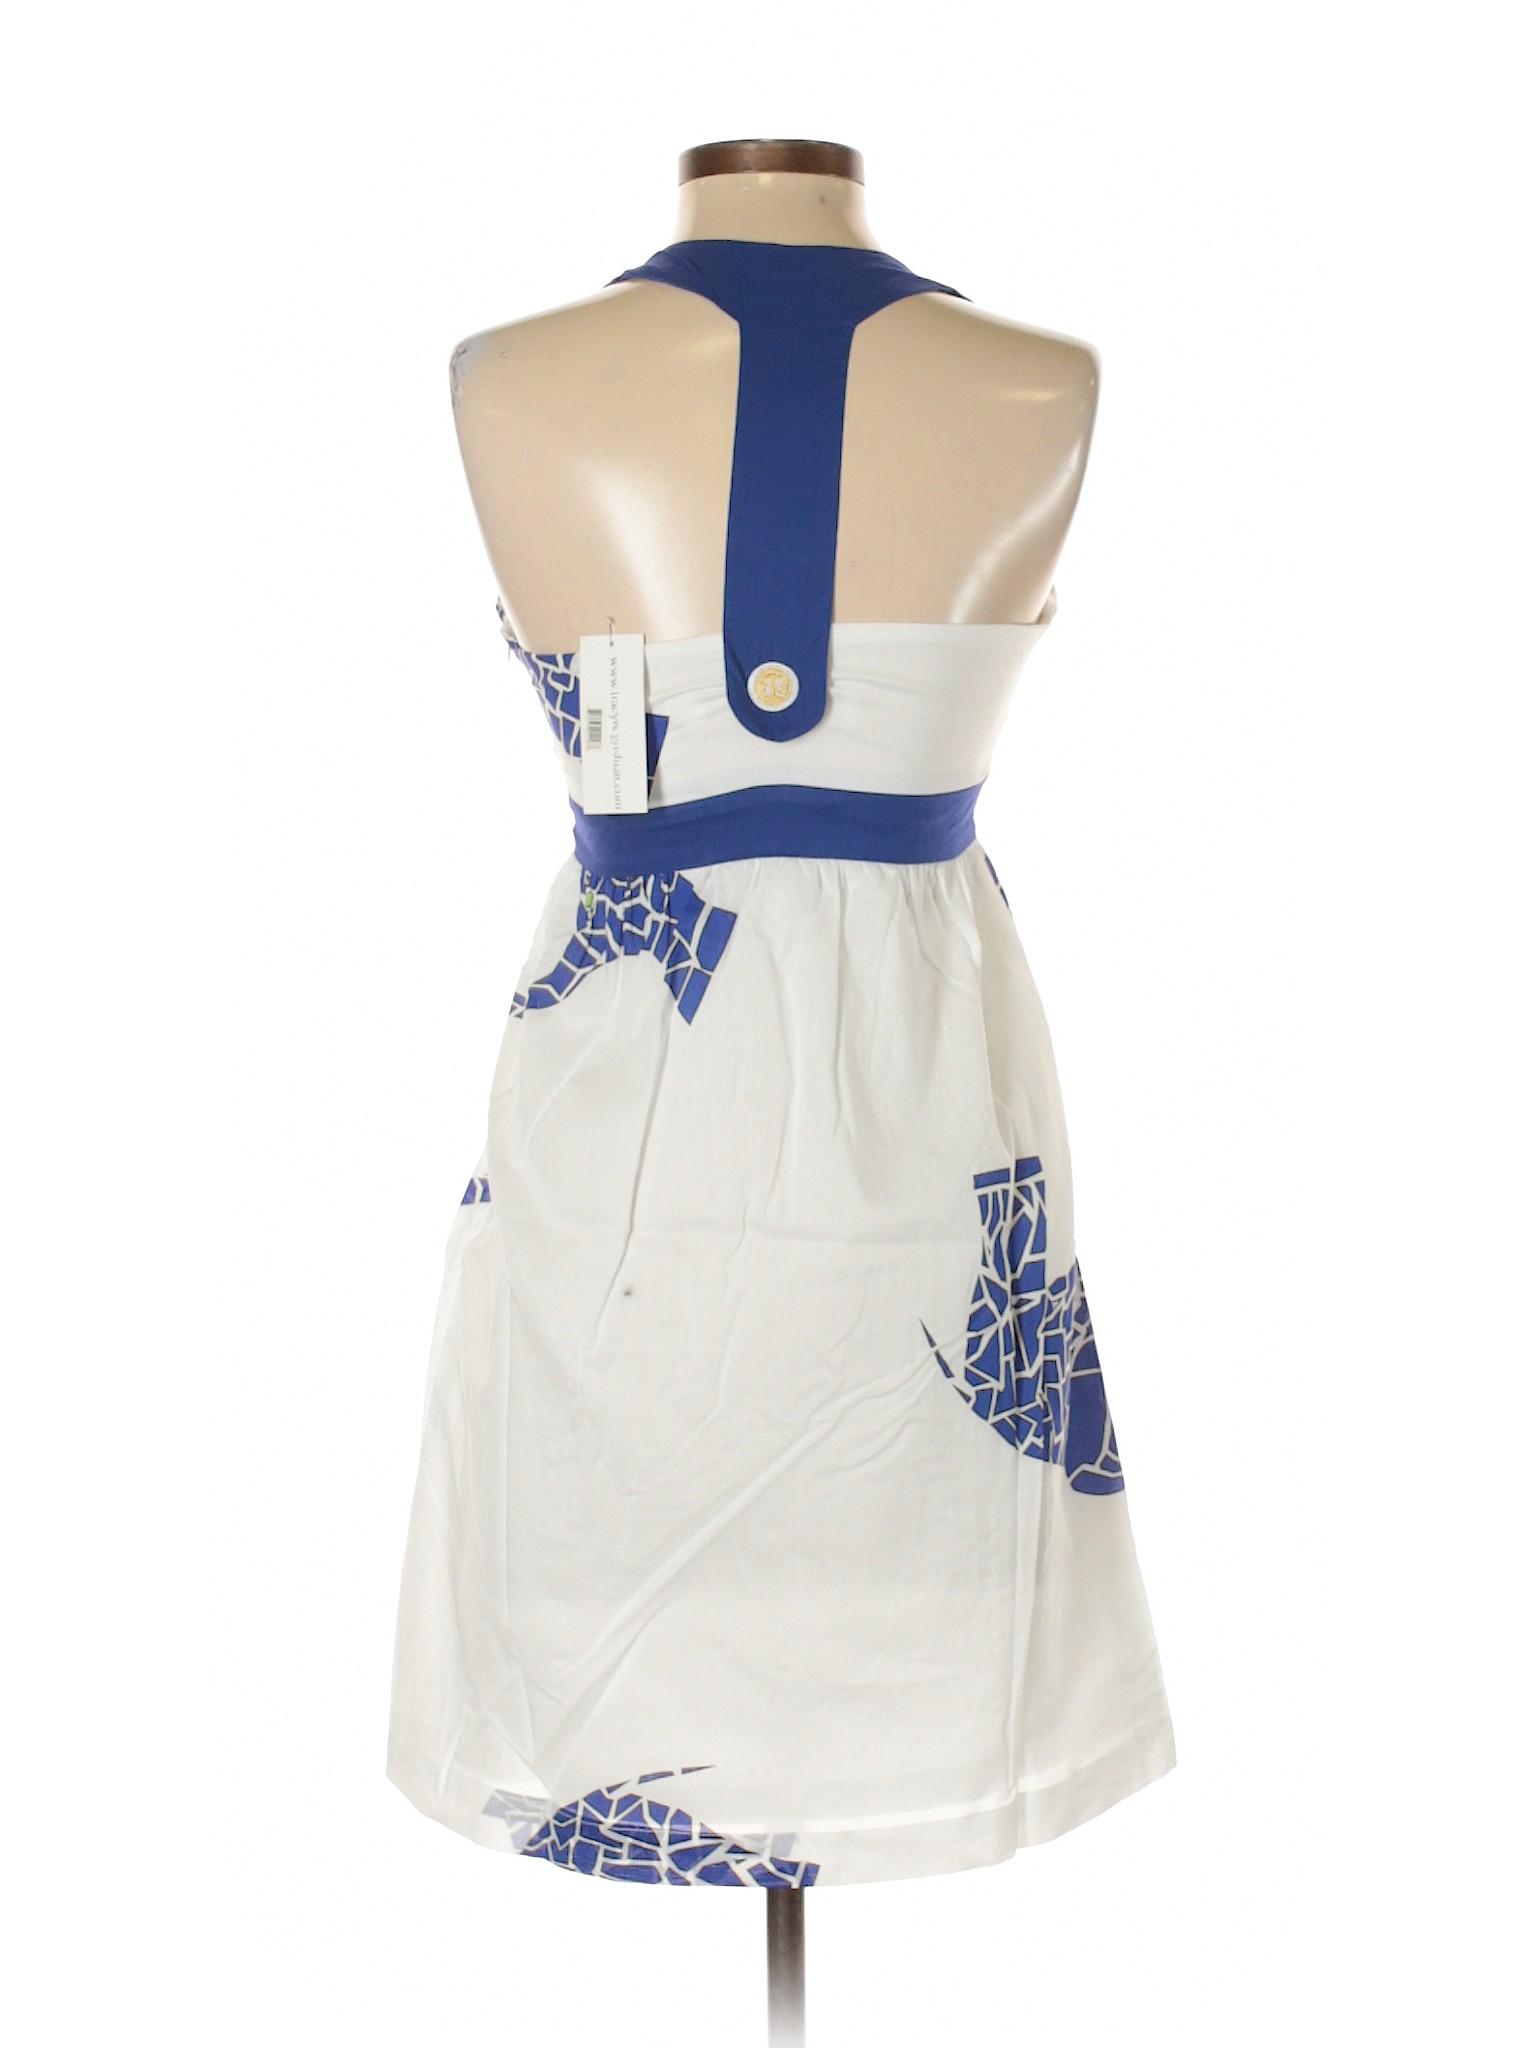 Selling TRACY TRACY NEGOSHIAN Dress Selling NEGOSHIAN Casual Casual PZq5wSSF